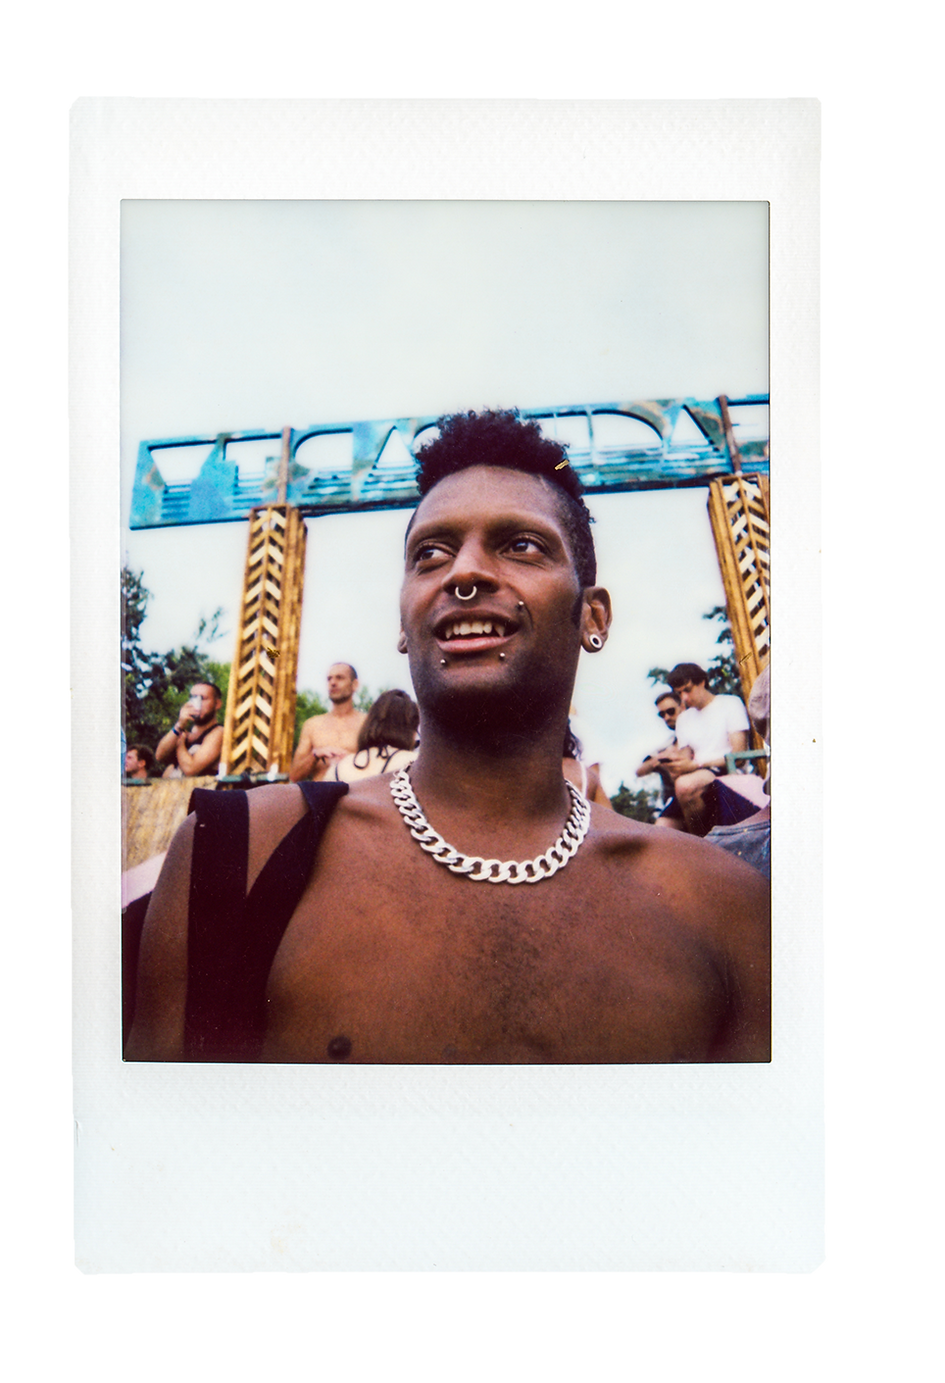 Outlook & Dimensions Festival, Croatia. Polaroid Originals Photography. Photo taken by Rob Jones @hirobjones